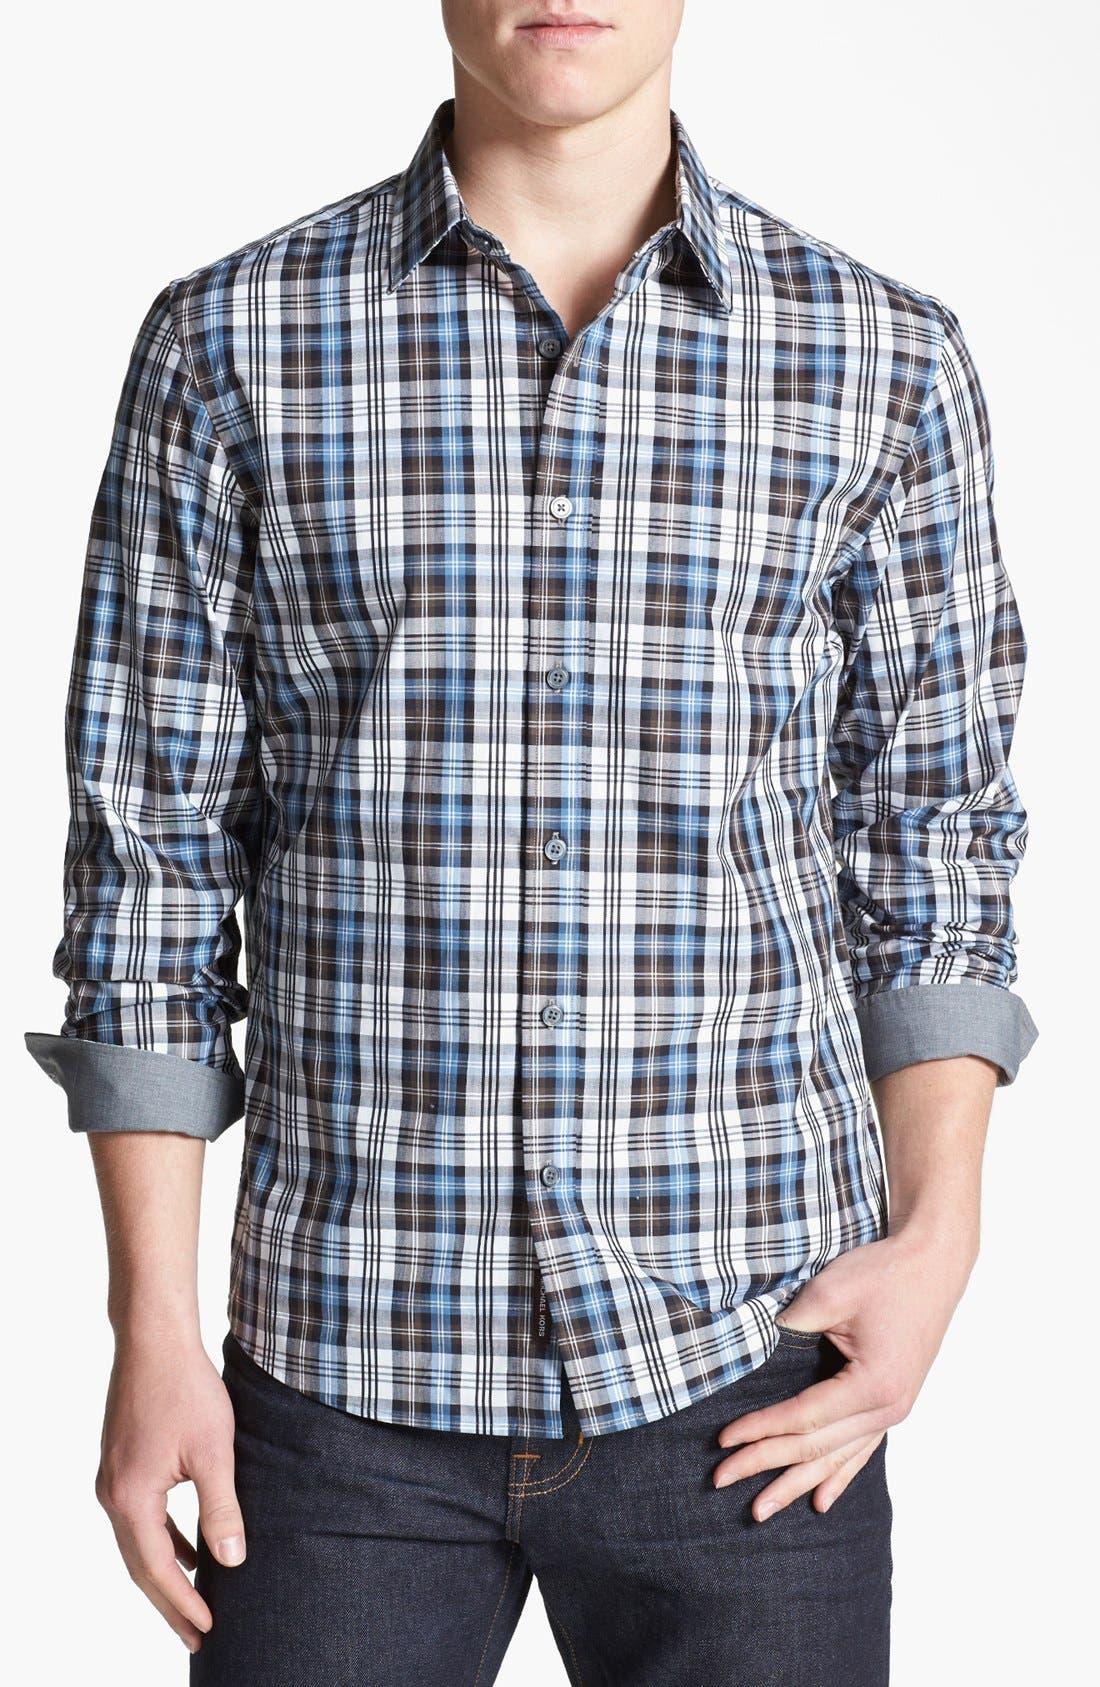 Alternate Image 1 Selected - Michael Kors 'Crispin Check' Regular Fit Sport Shirt